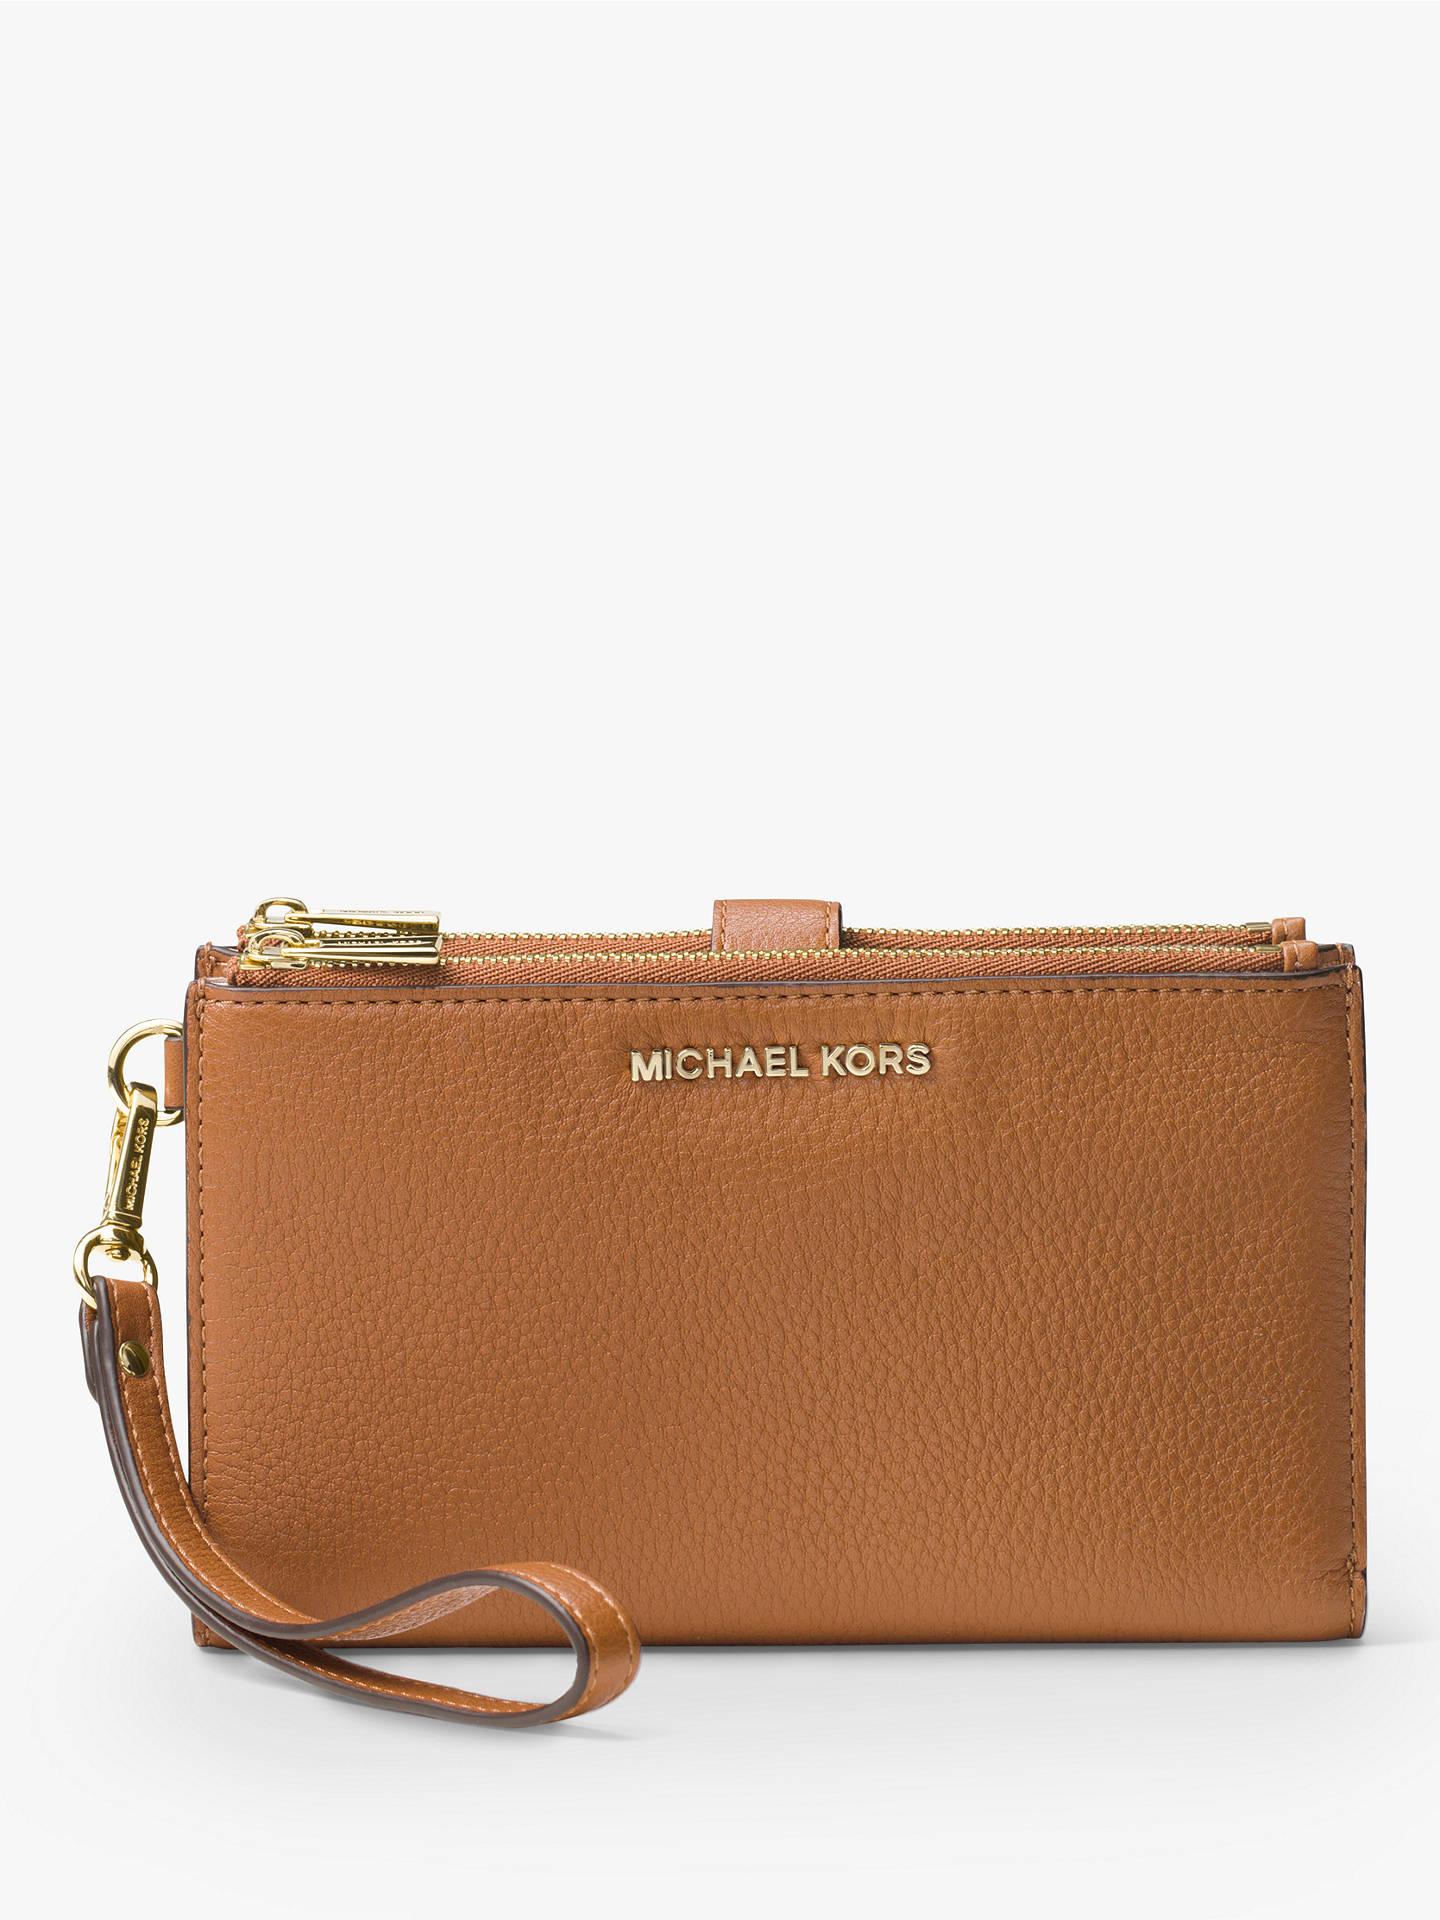 b4d7114e48d457 Buy MICHAEL Michael Kors Adele Leather Smartphone Wallet, Acorn Online at  johnlewis.com ...